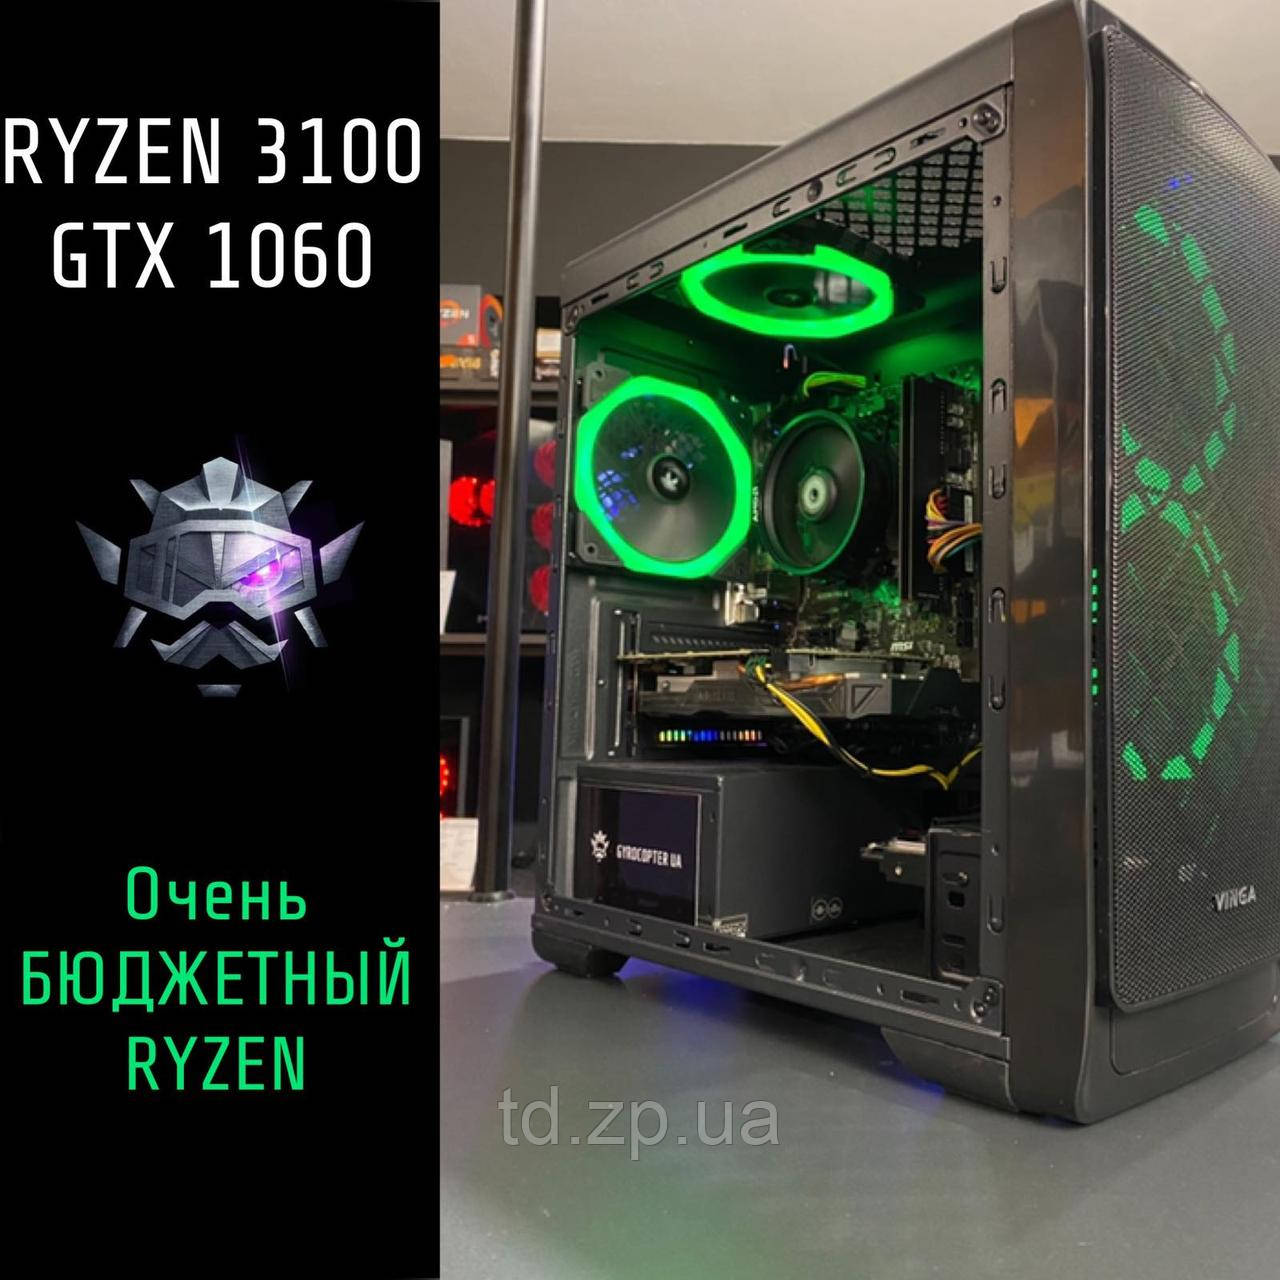 Игровой компьютер AMD RYZEN 5 2600 + GTX 1060 3Gb + RAM 8Gb + HDD 500Gb + SSD 120gb